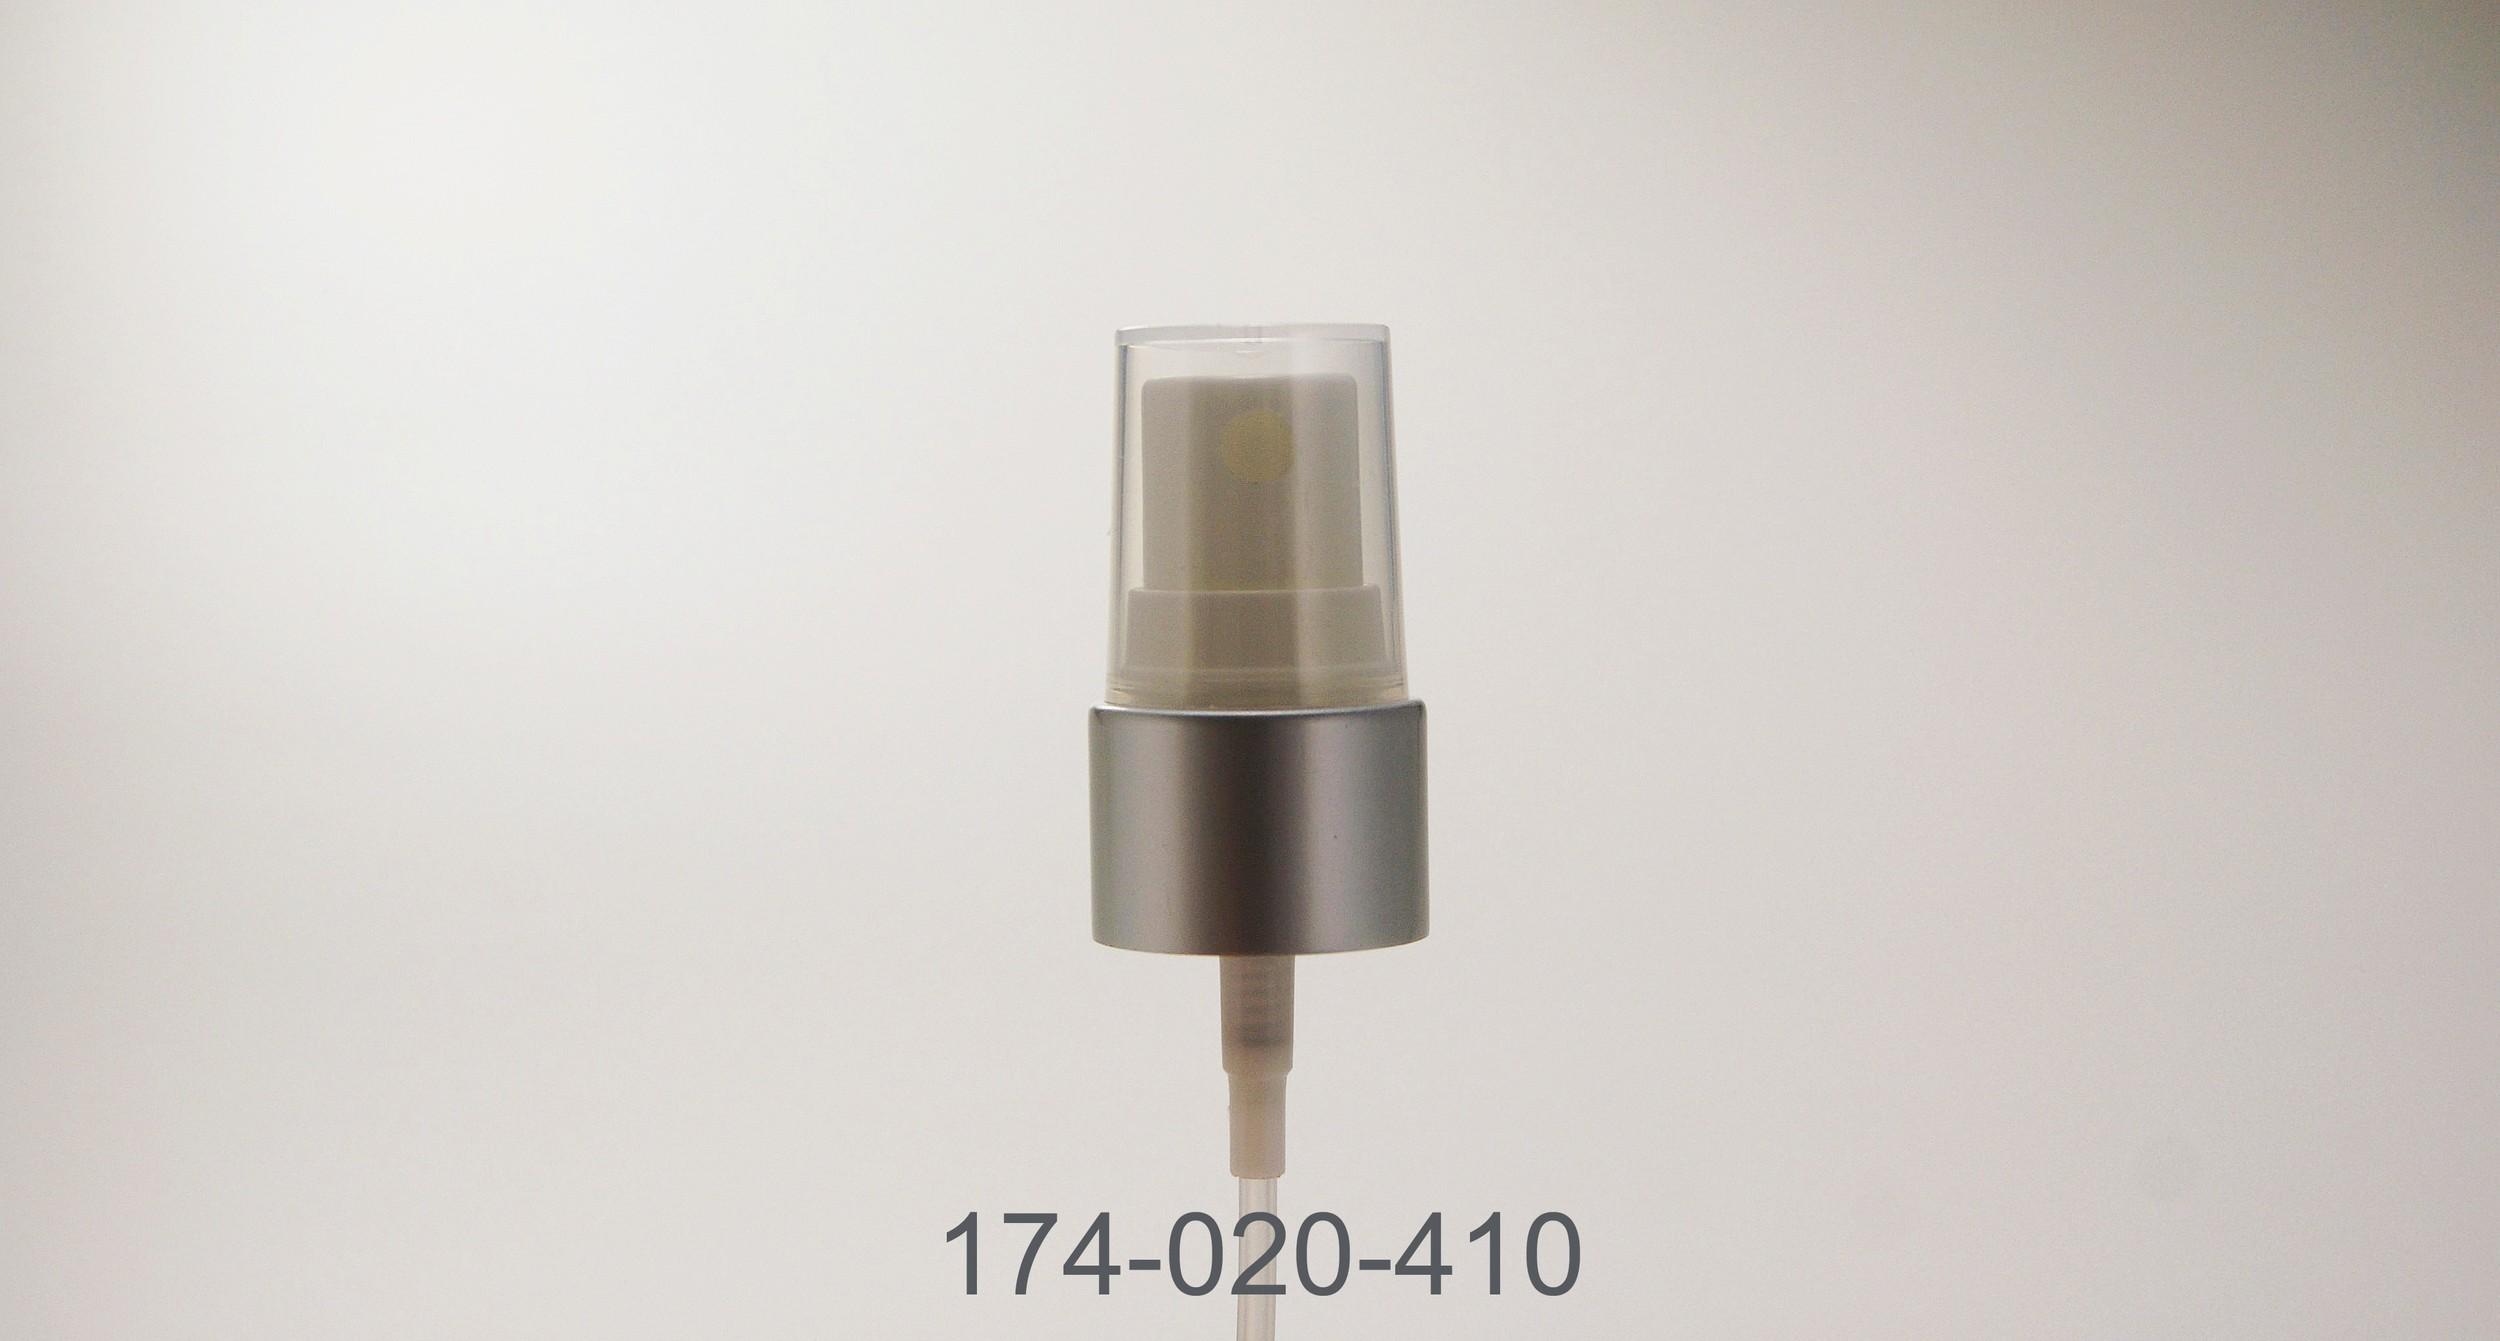 174-020-410 ms.jpg